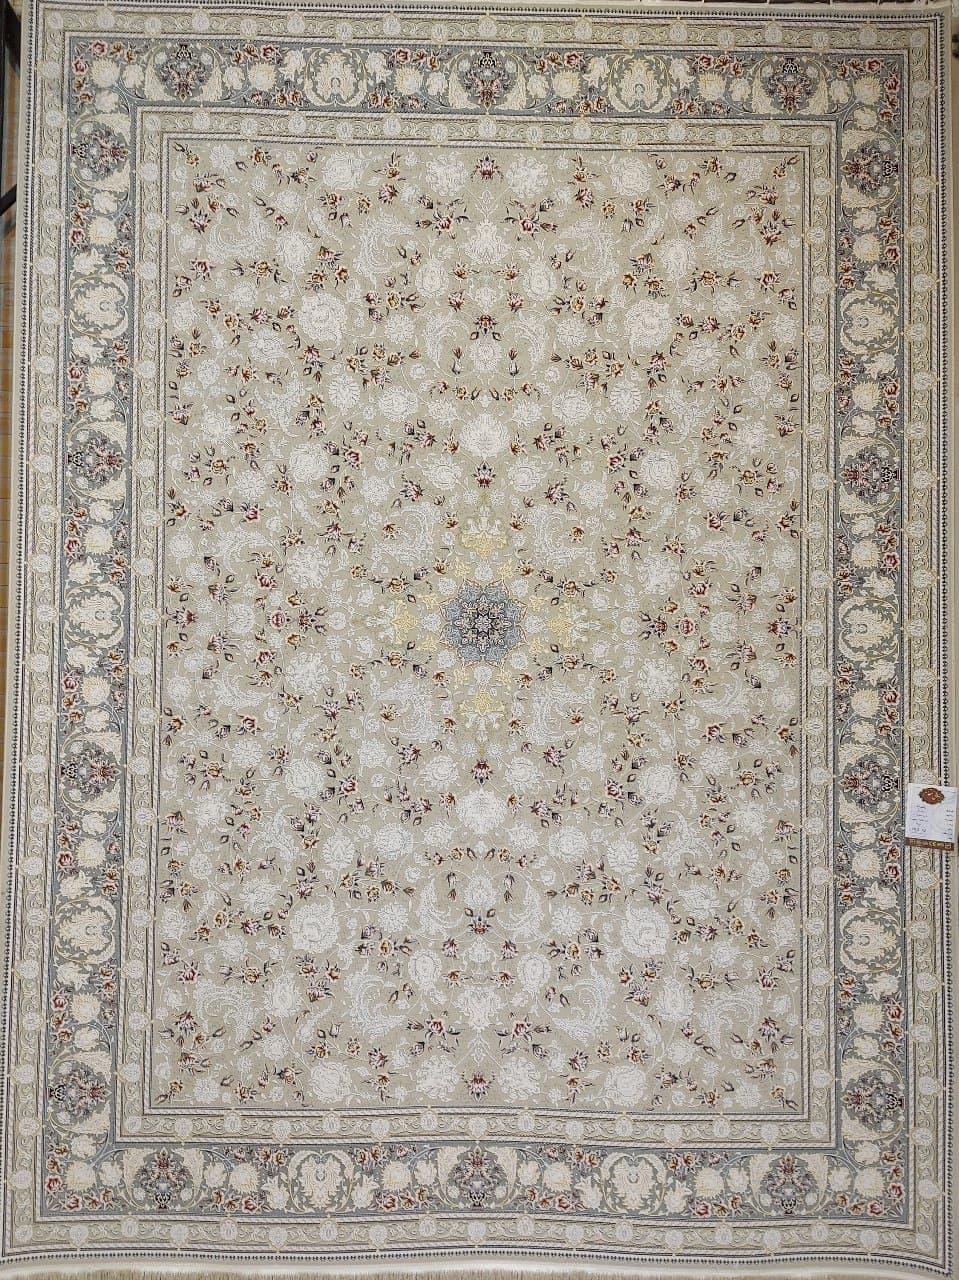 فرش 1500 شانه گل برجسته نقشه رکسانا زمینه ترمه ای